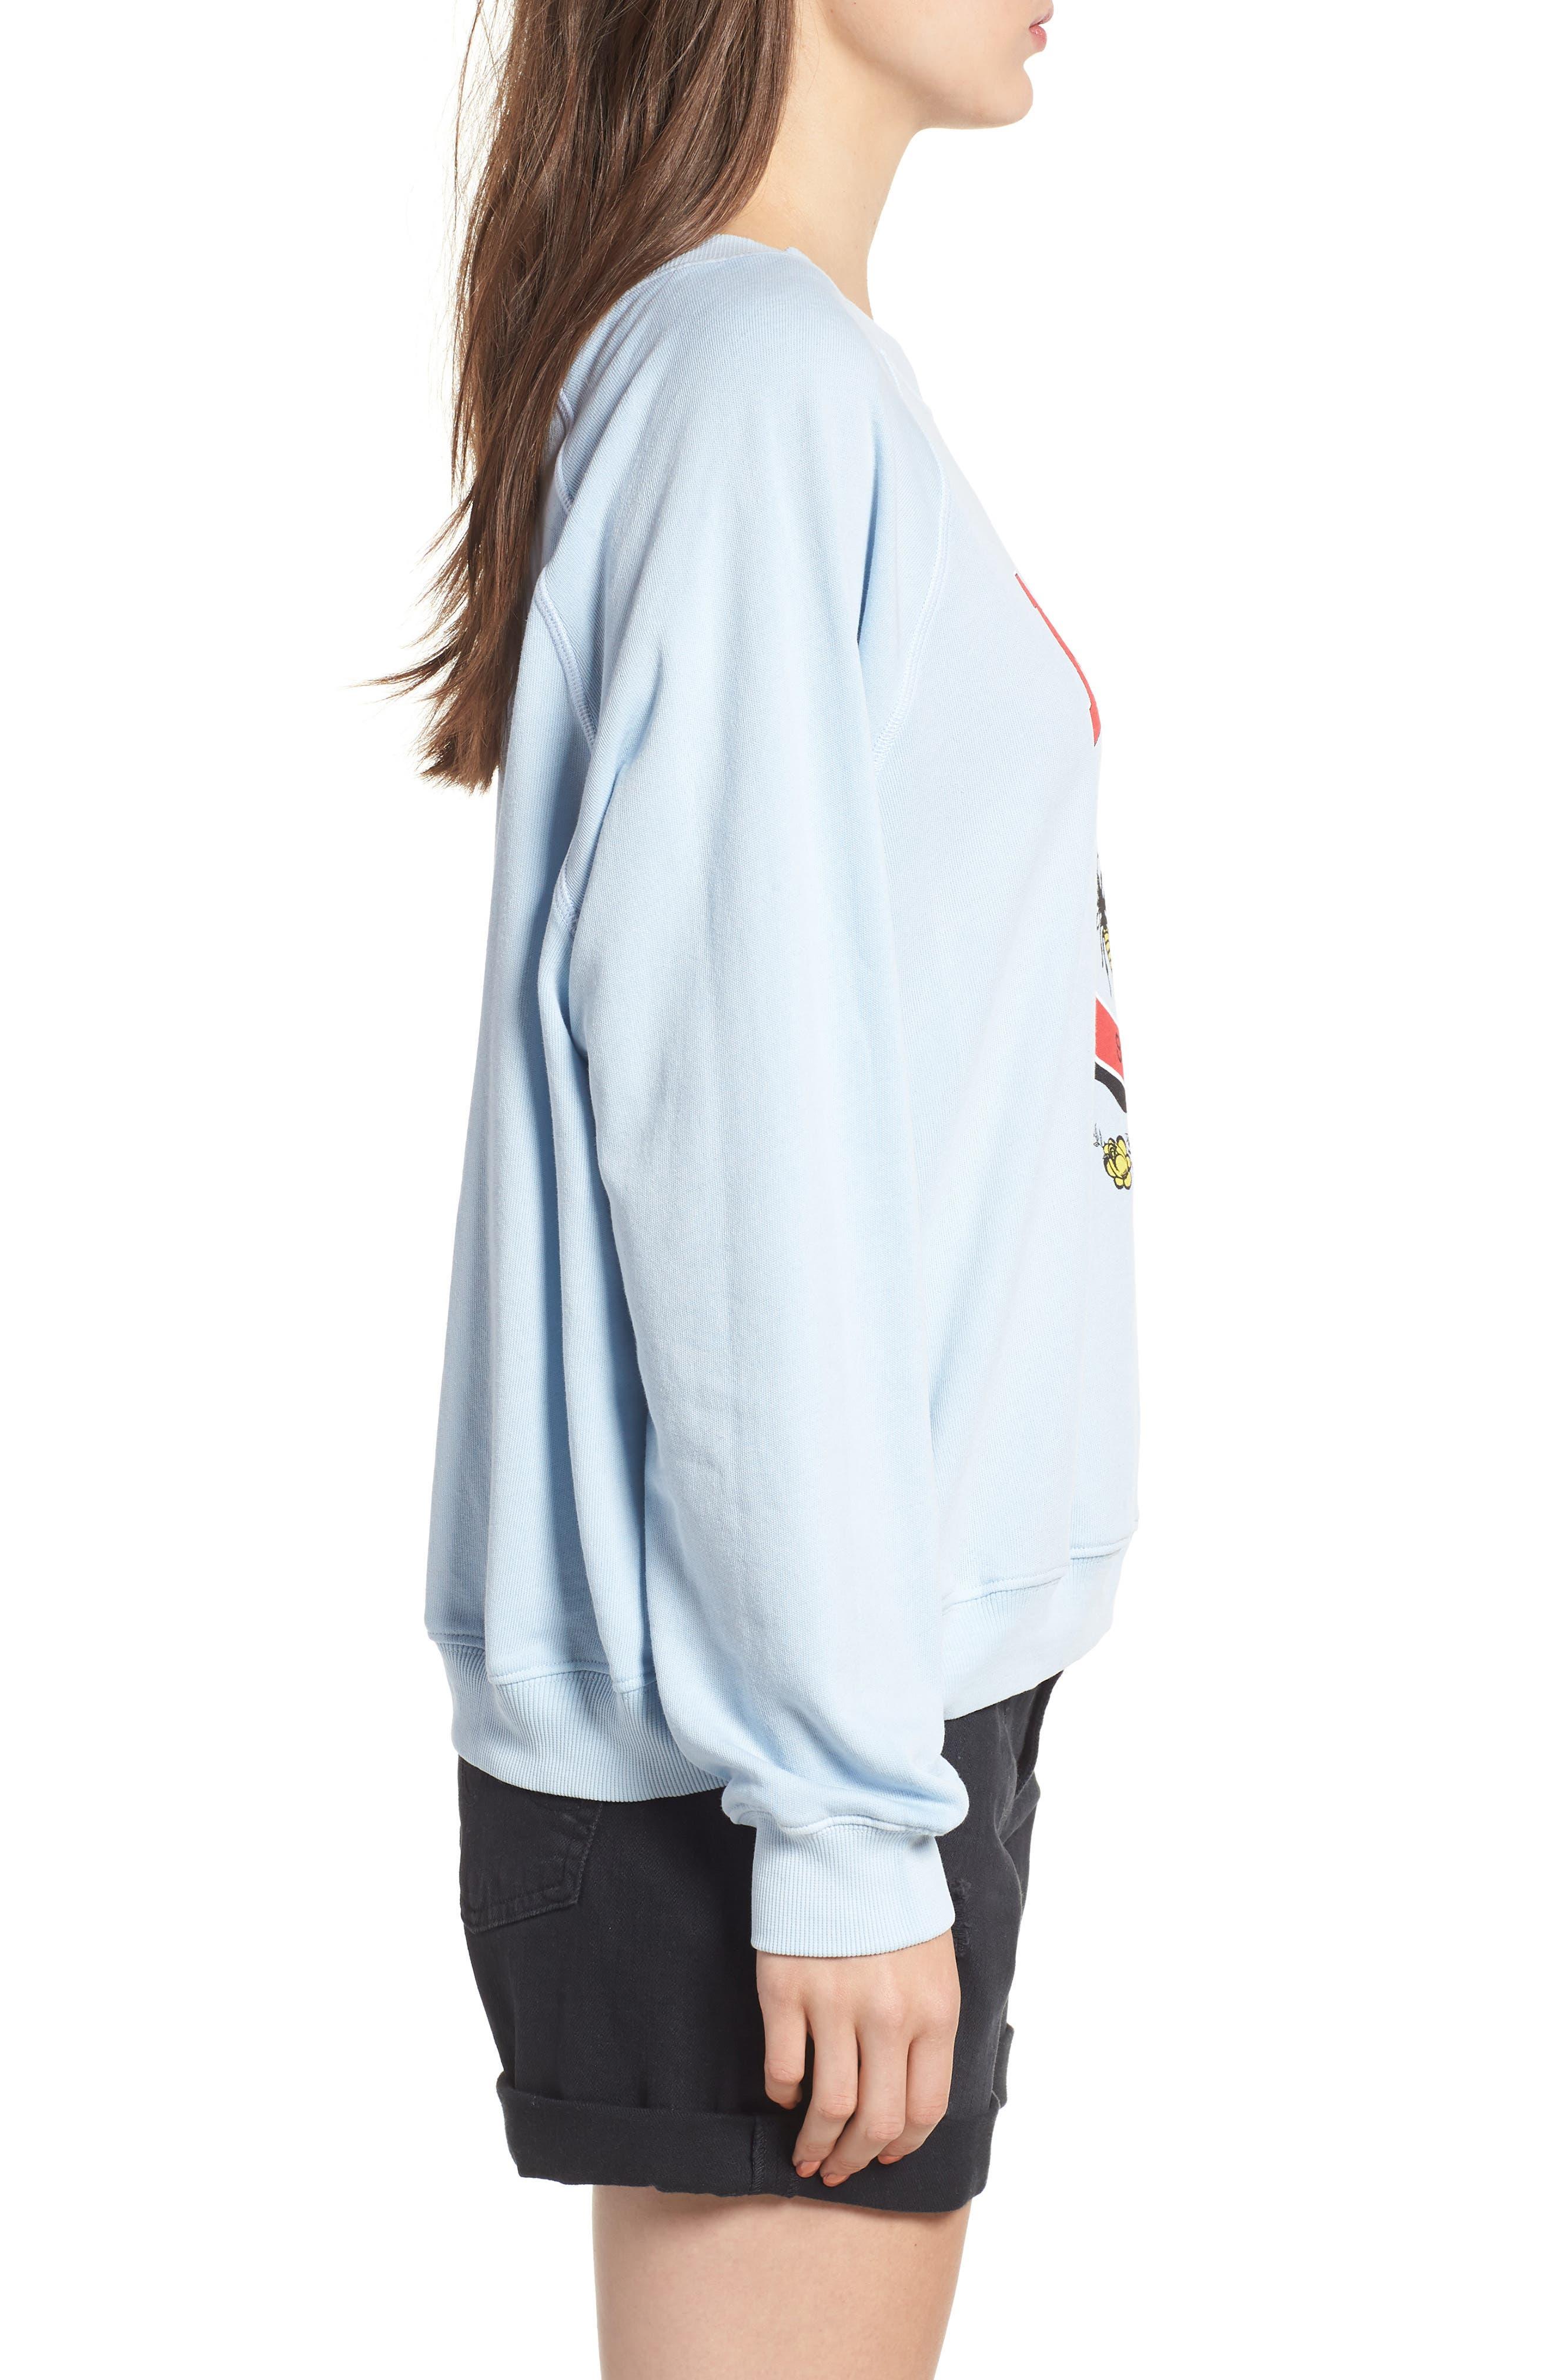 Malibu Crest Sommers Sweatshirt,                             Alternate thumbnail 3, color,                             400